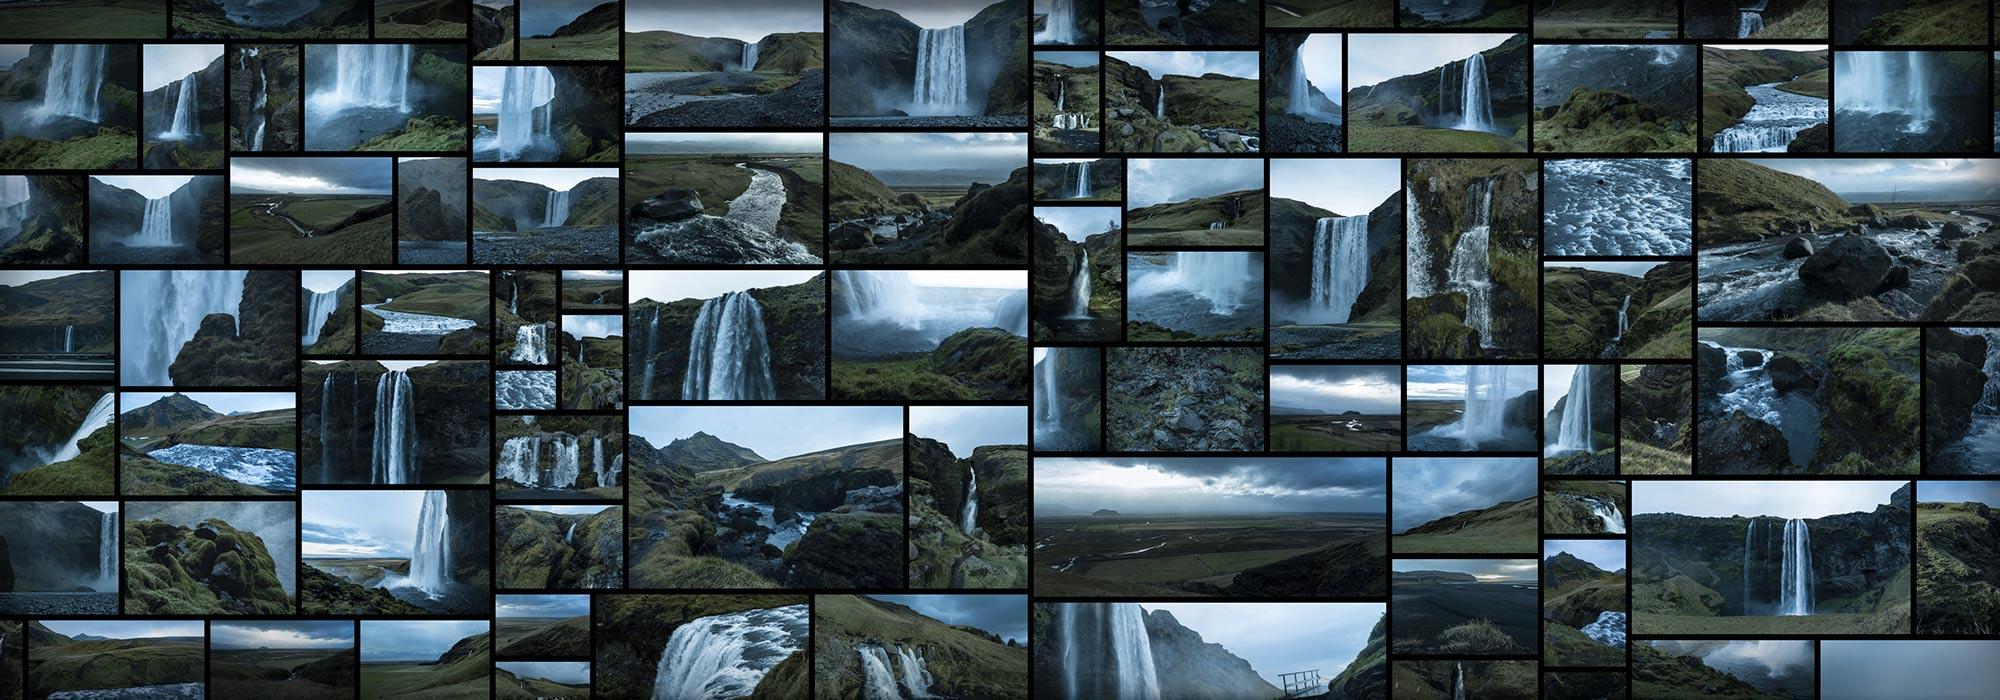 Icelandic Waterfalls Cascades Foggy Misty Mood